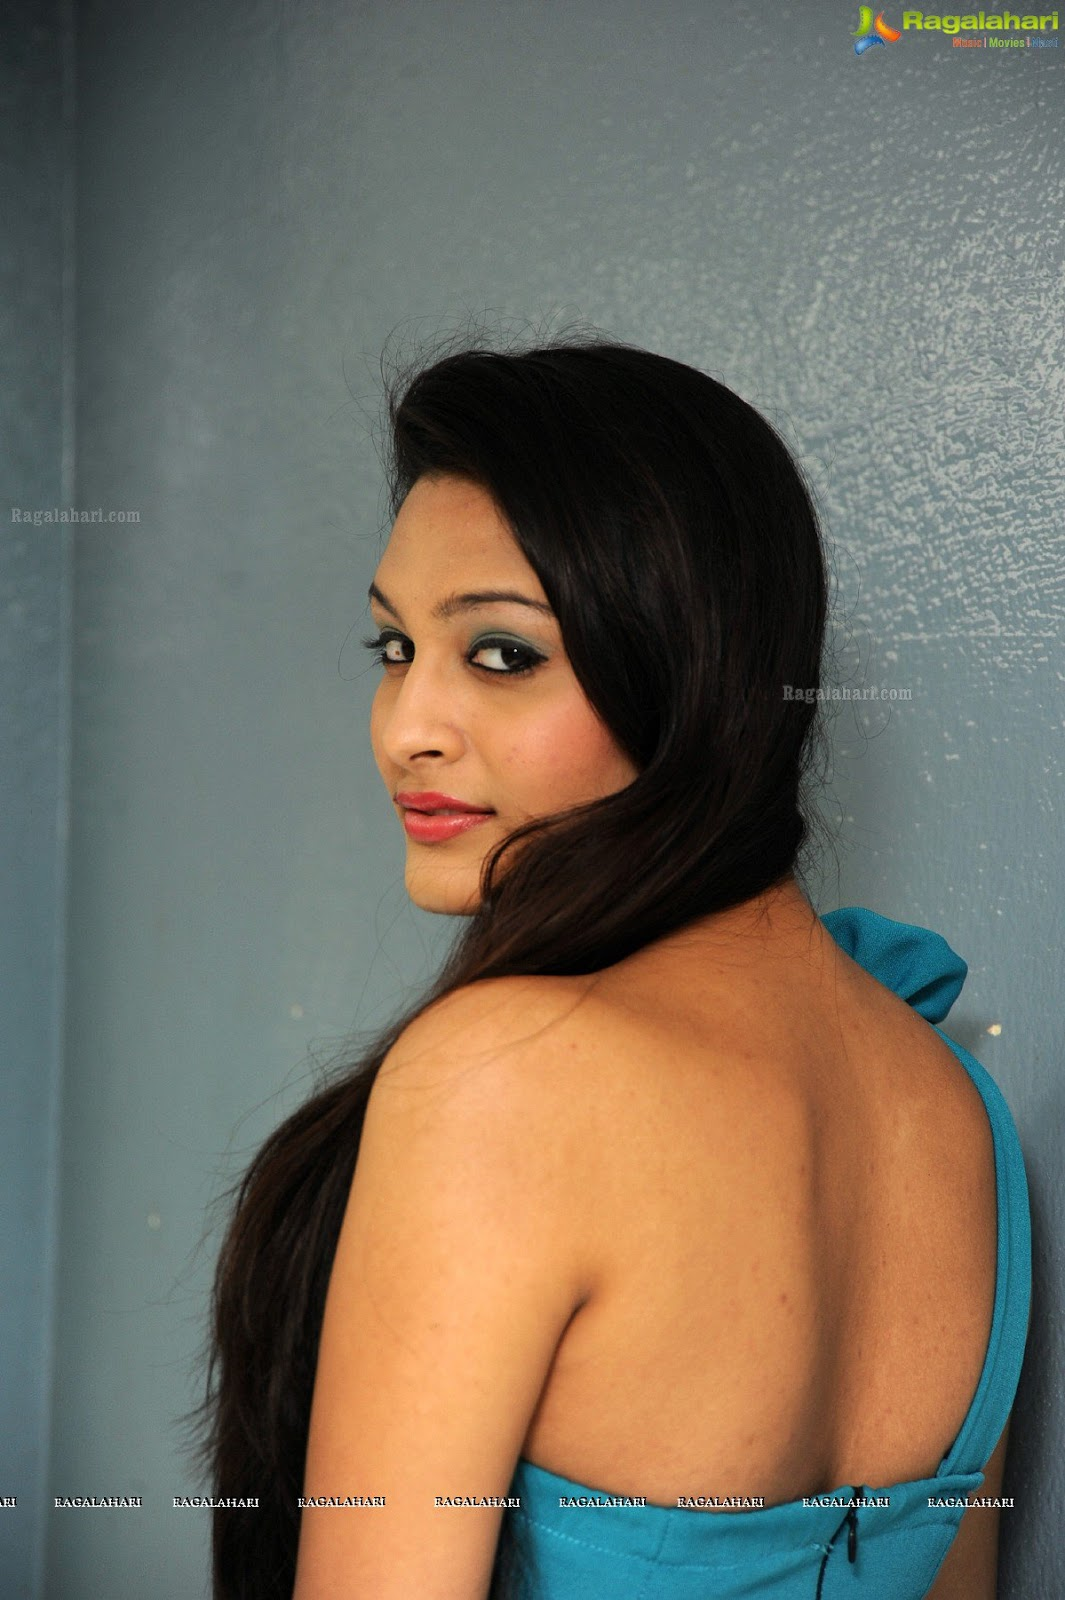 South Actress Hot Navel Photos In Saree Blouse That Will -7559